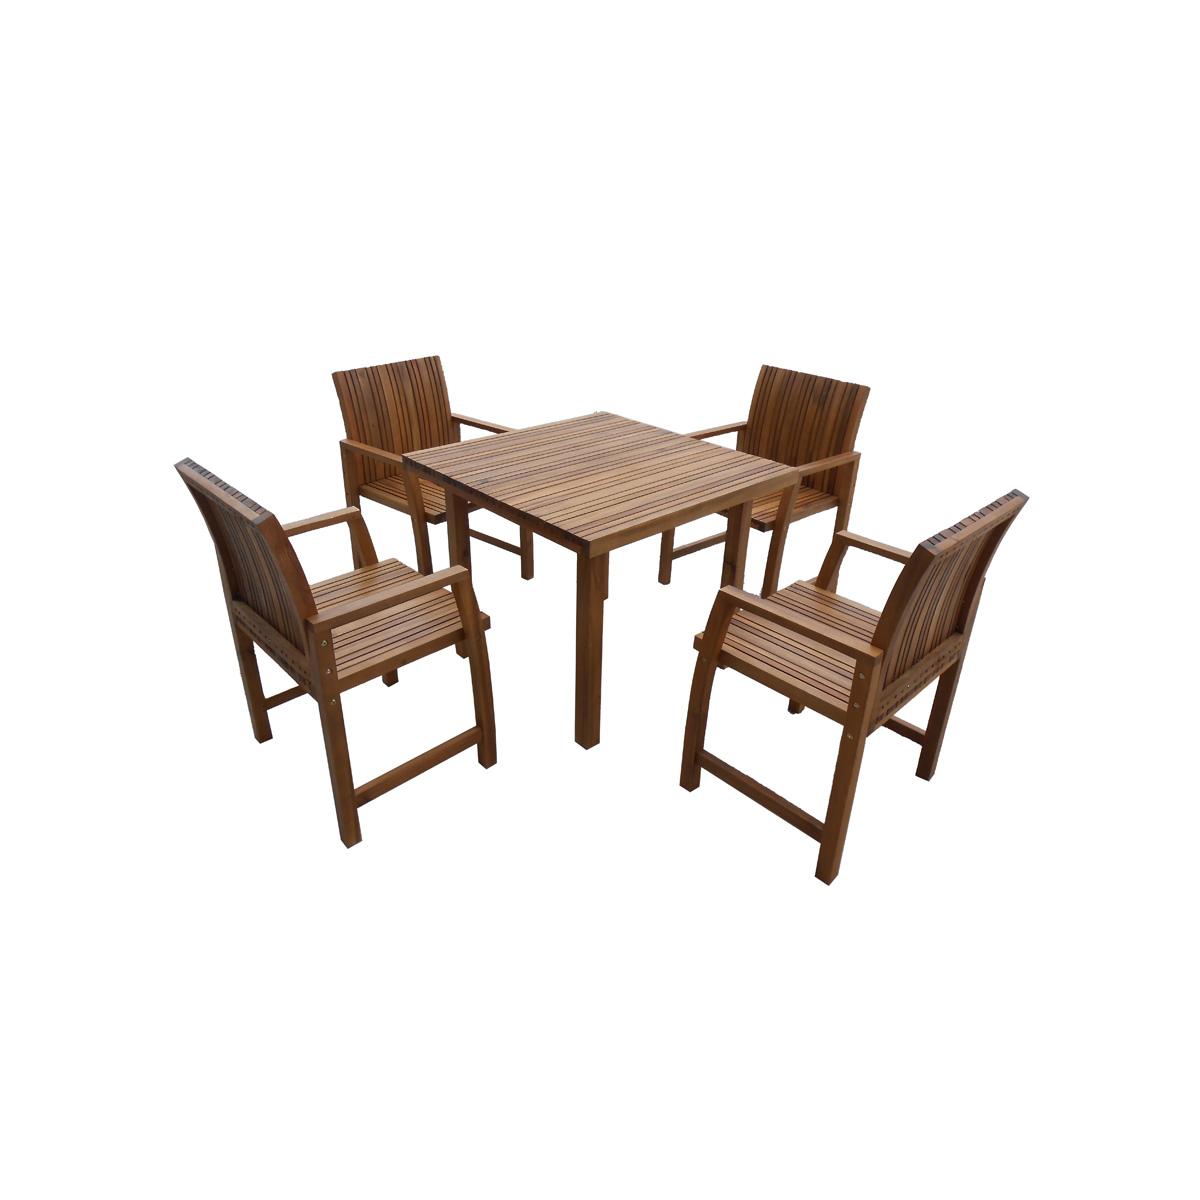 office chair vietnam big comfy ht02 hà thanh furniture